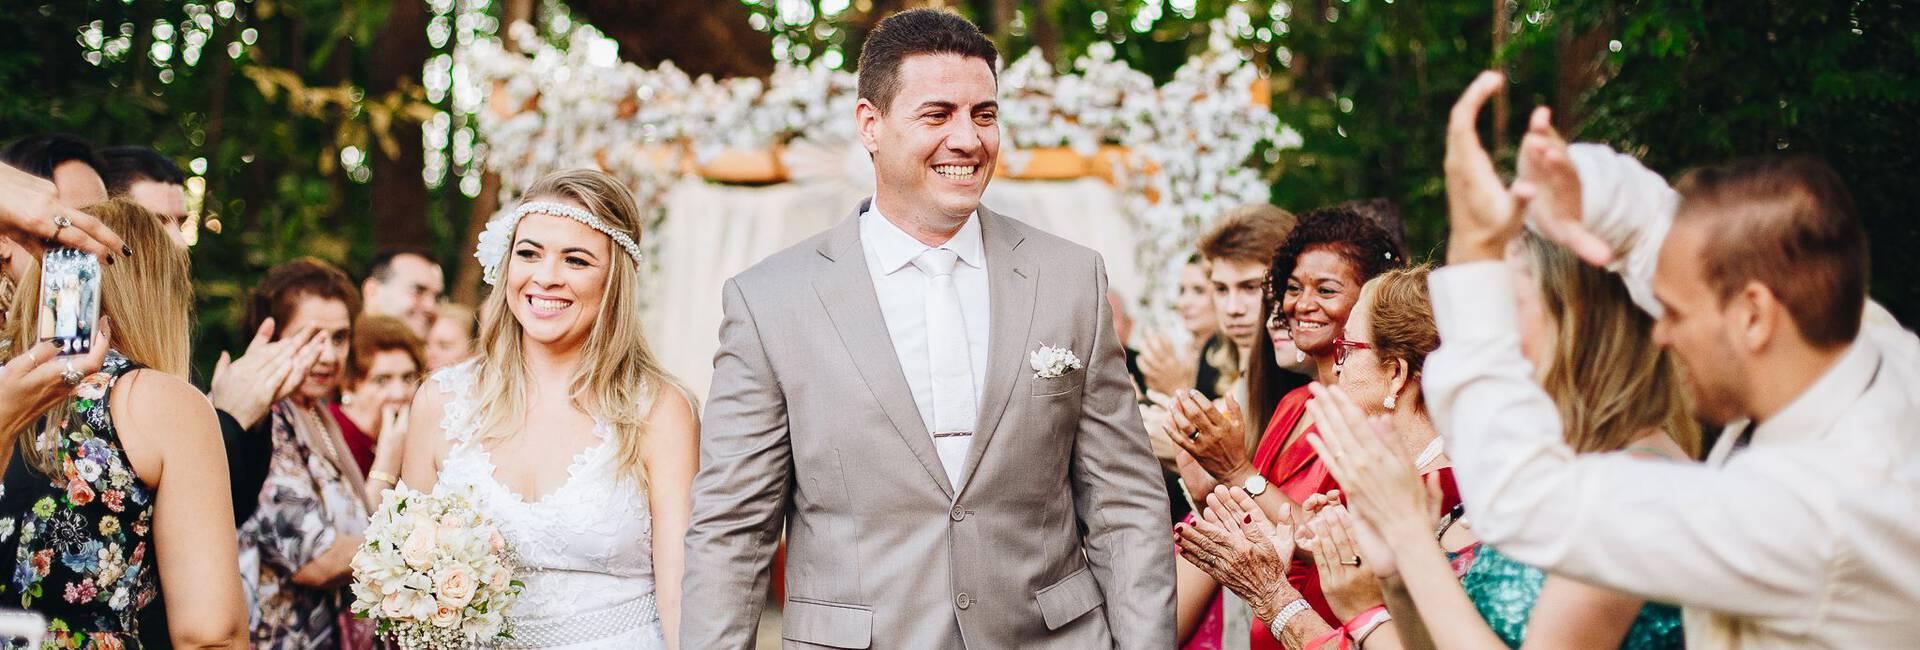 Casamento de Celine e Hilton